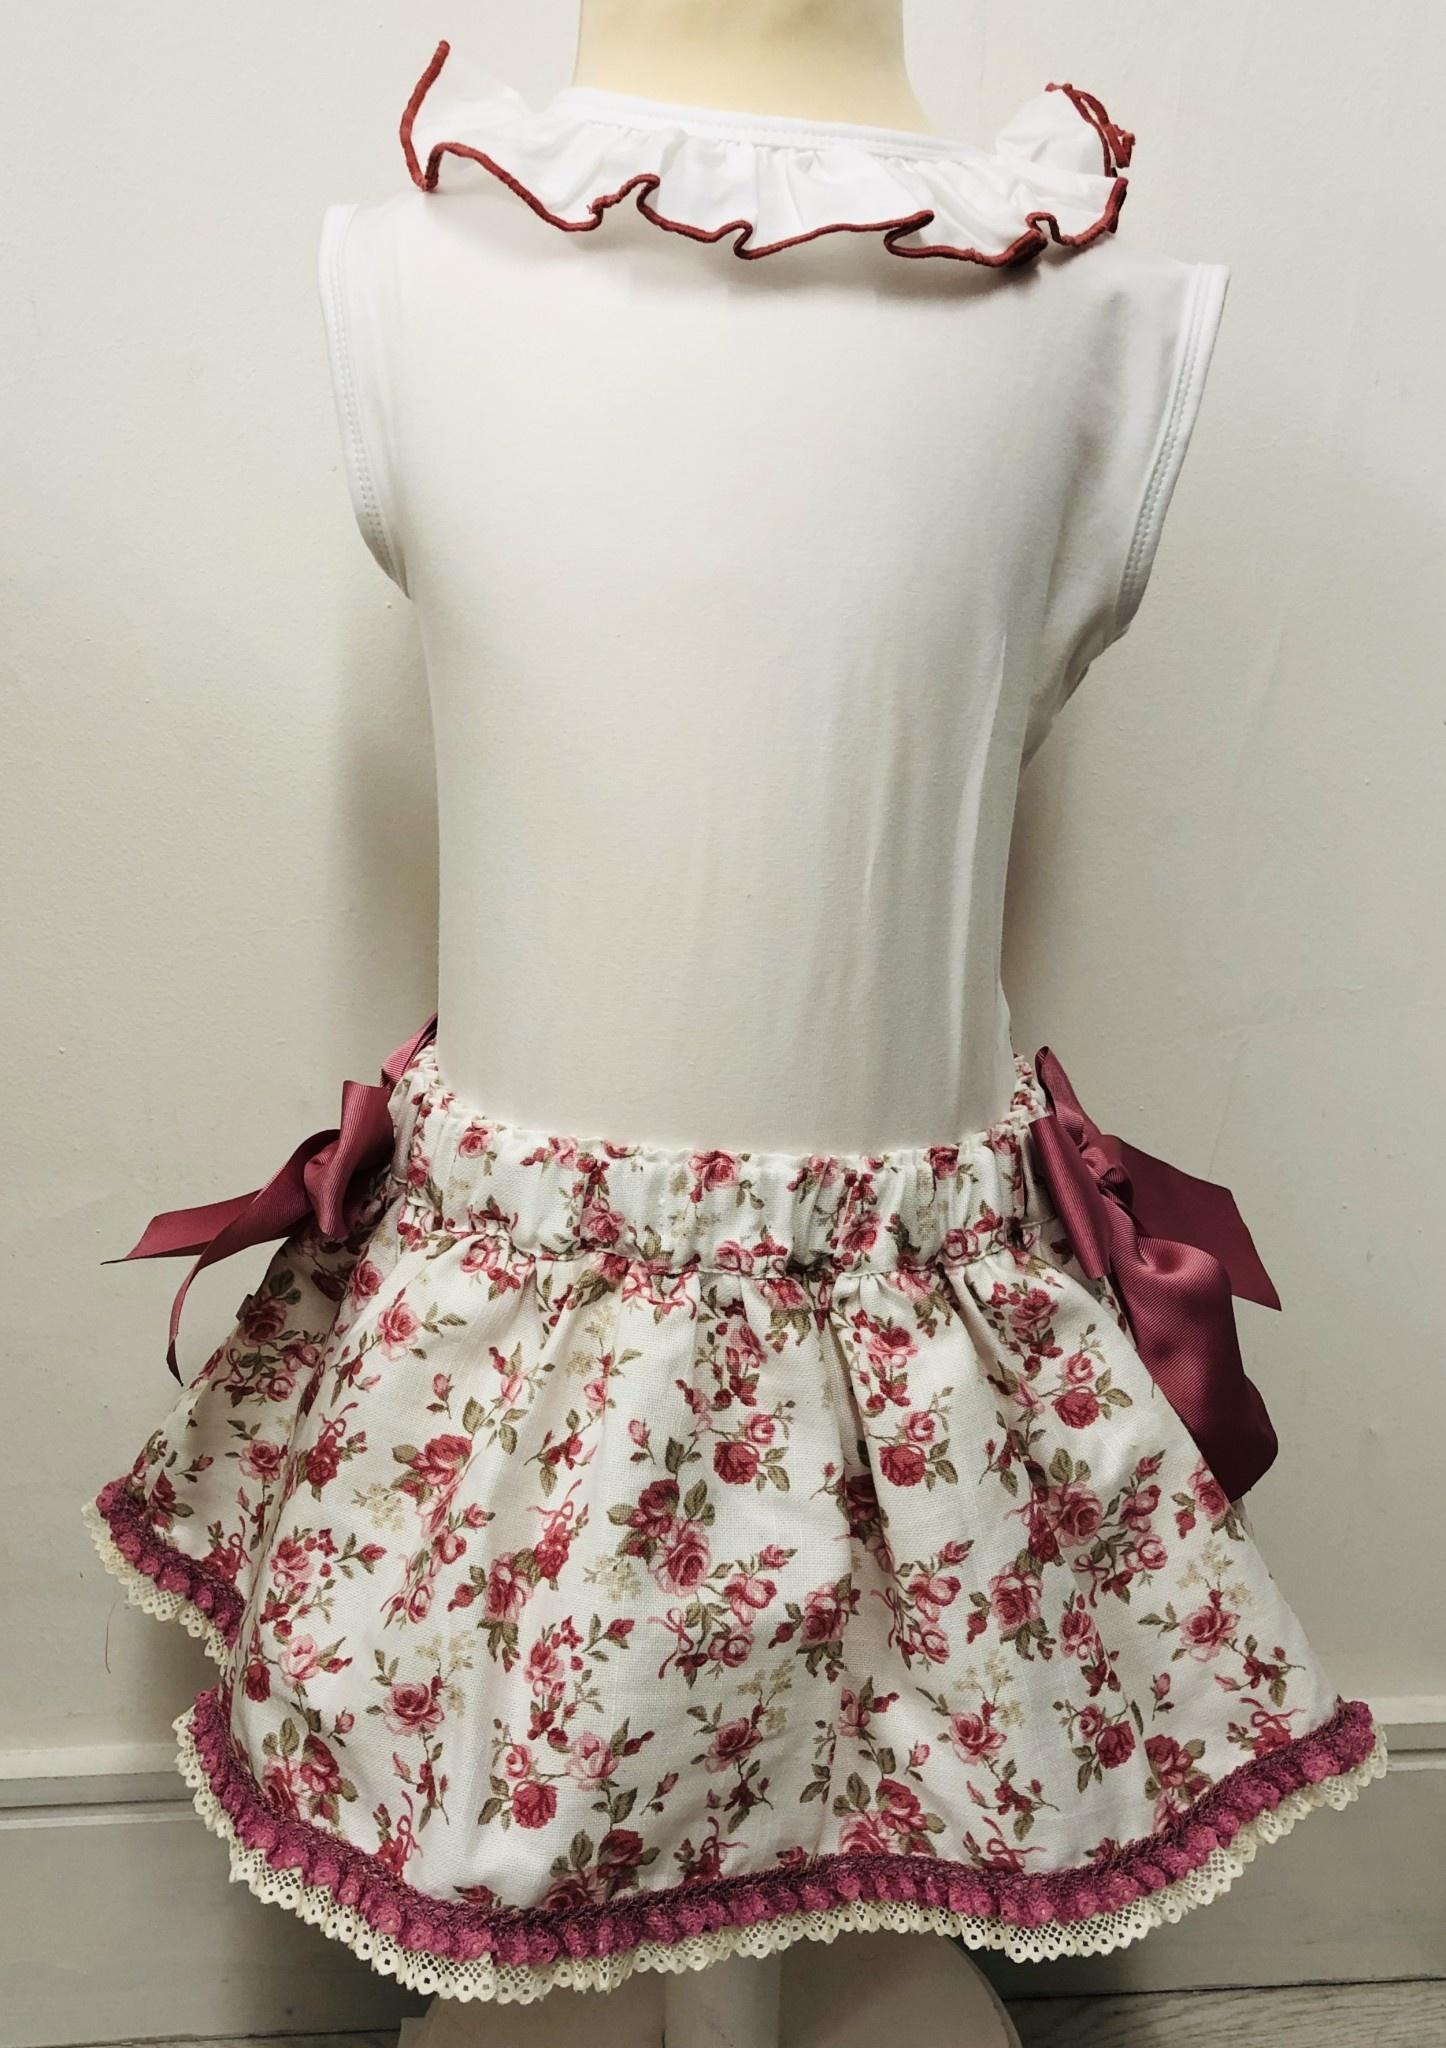 Bogoleta Bogoleta Rose Top and Skirt with Pants & Bow Detail